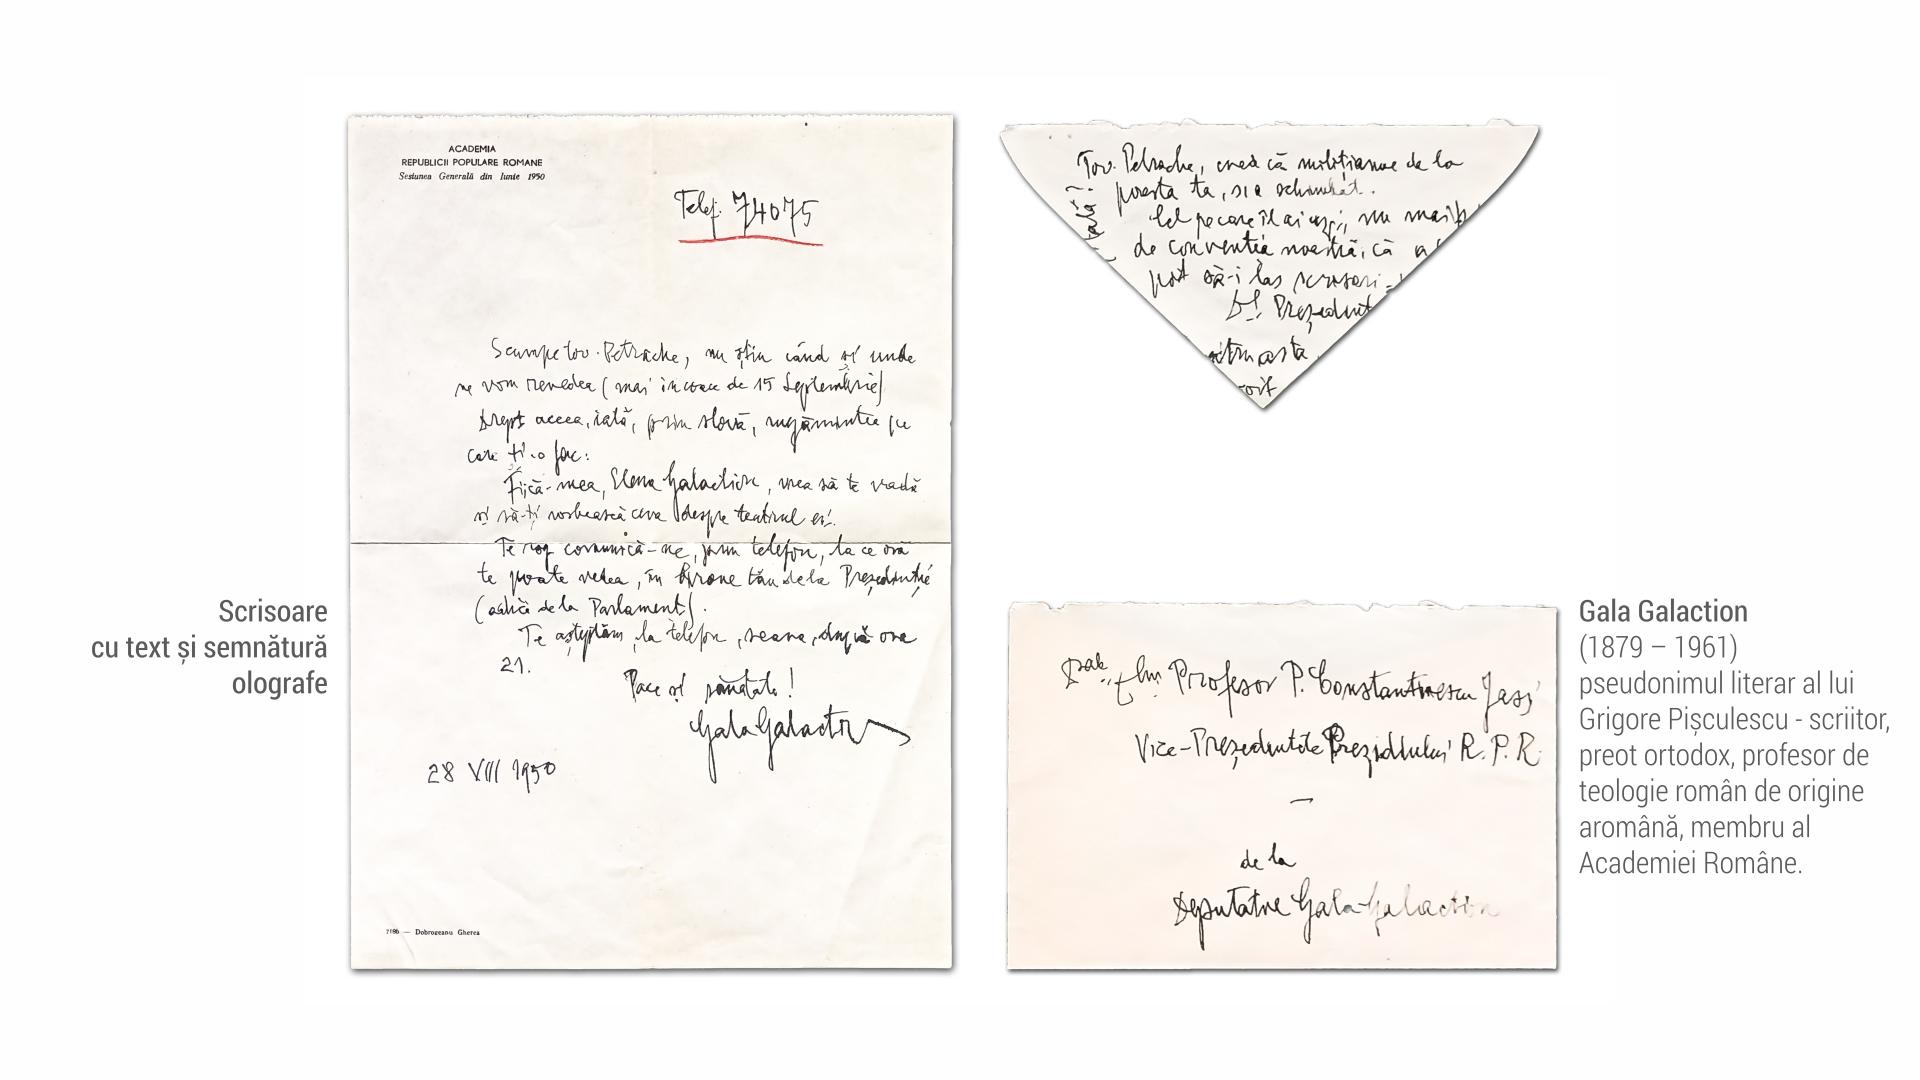 1879 Gala Galaction - scrisoare